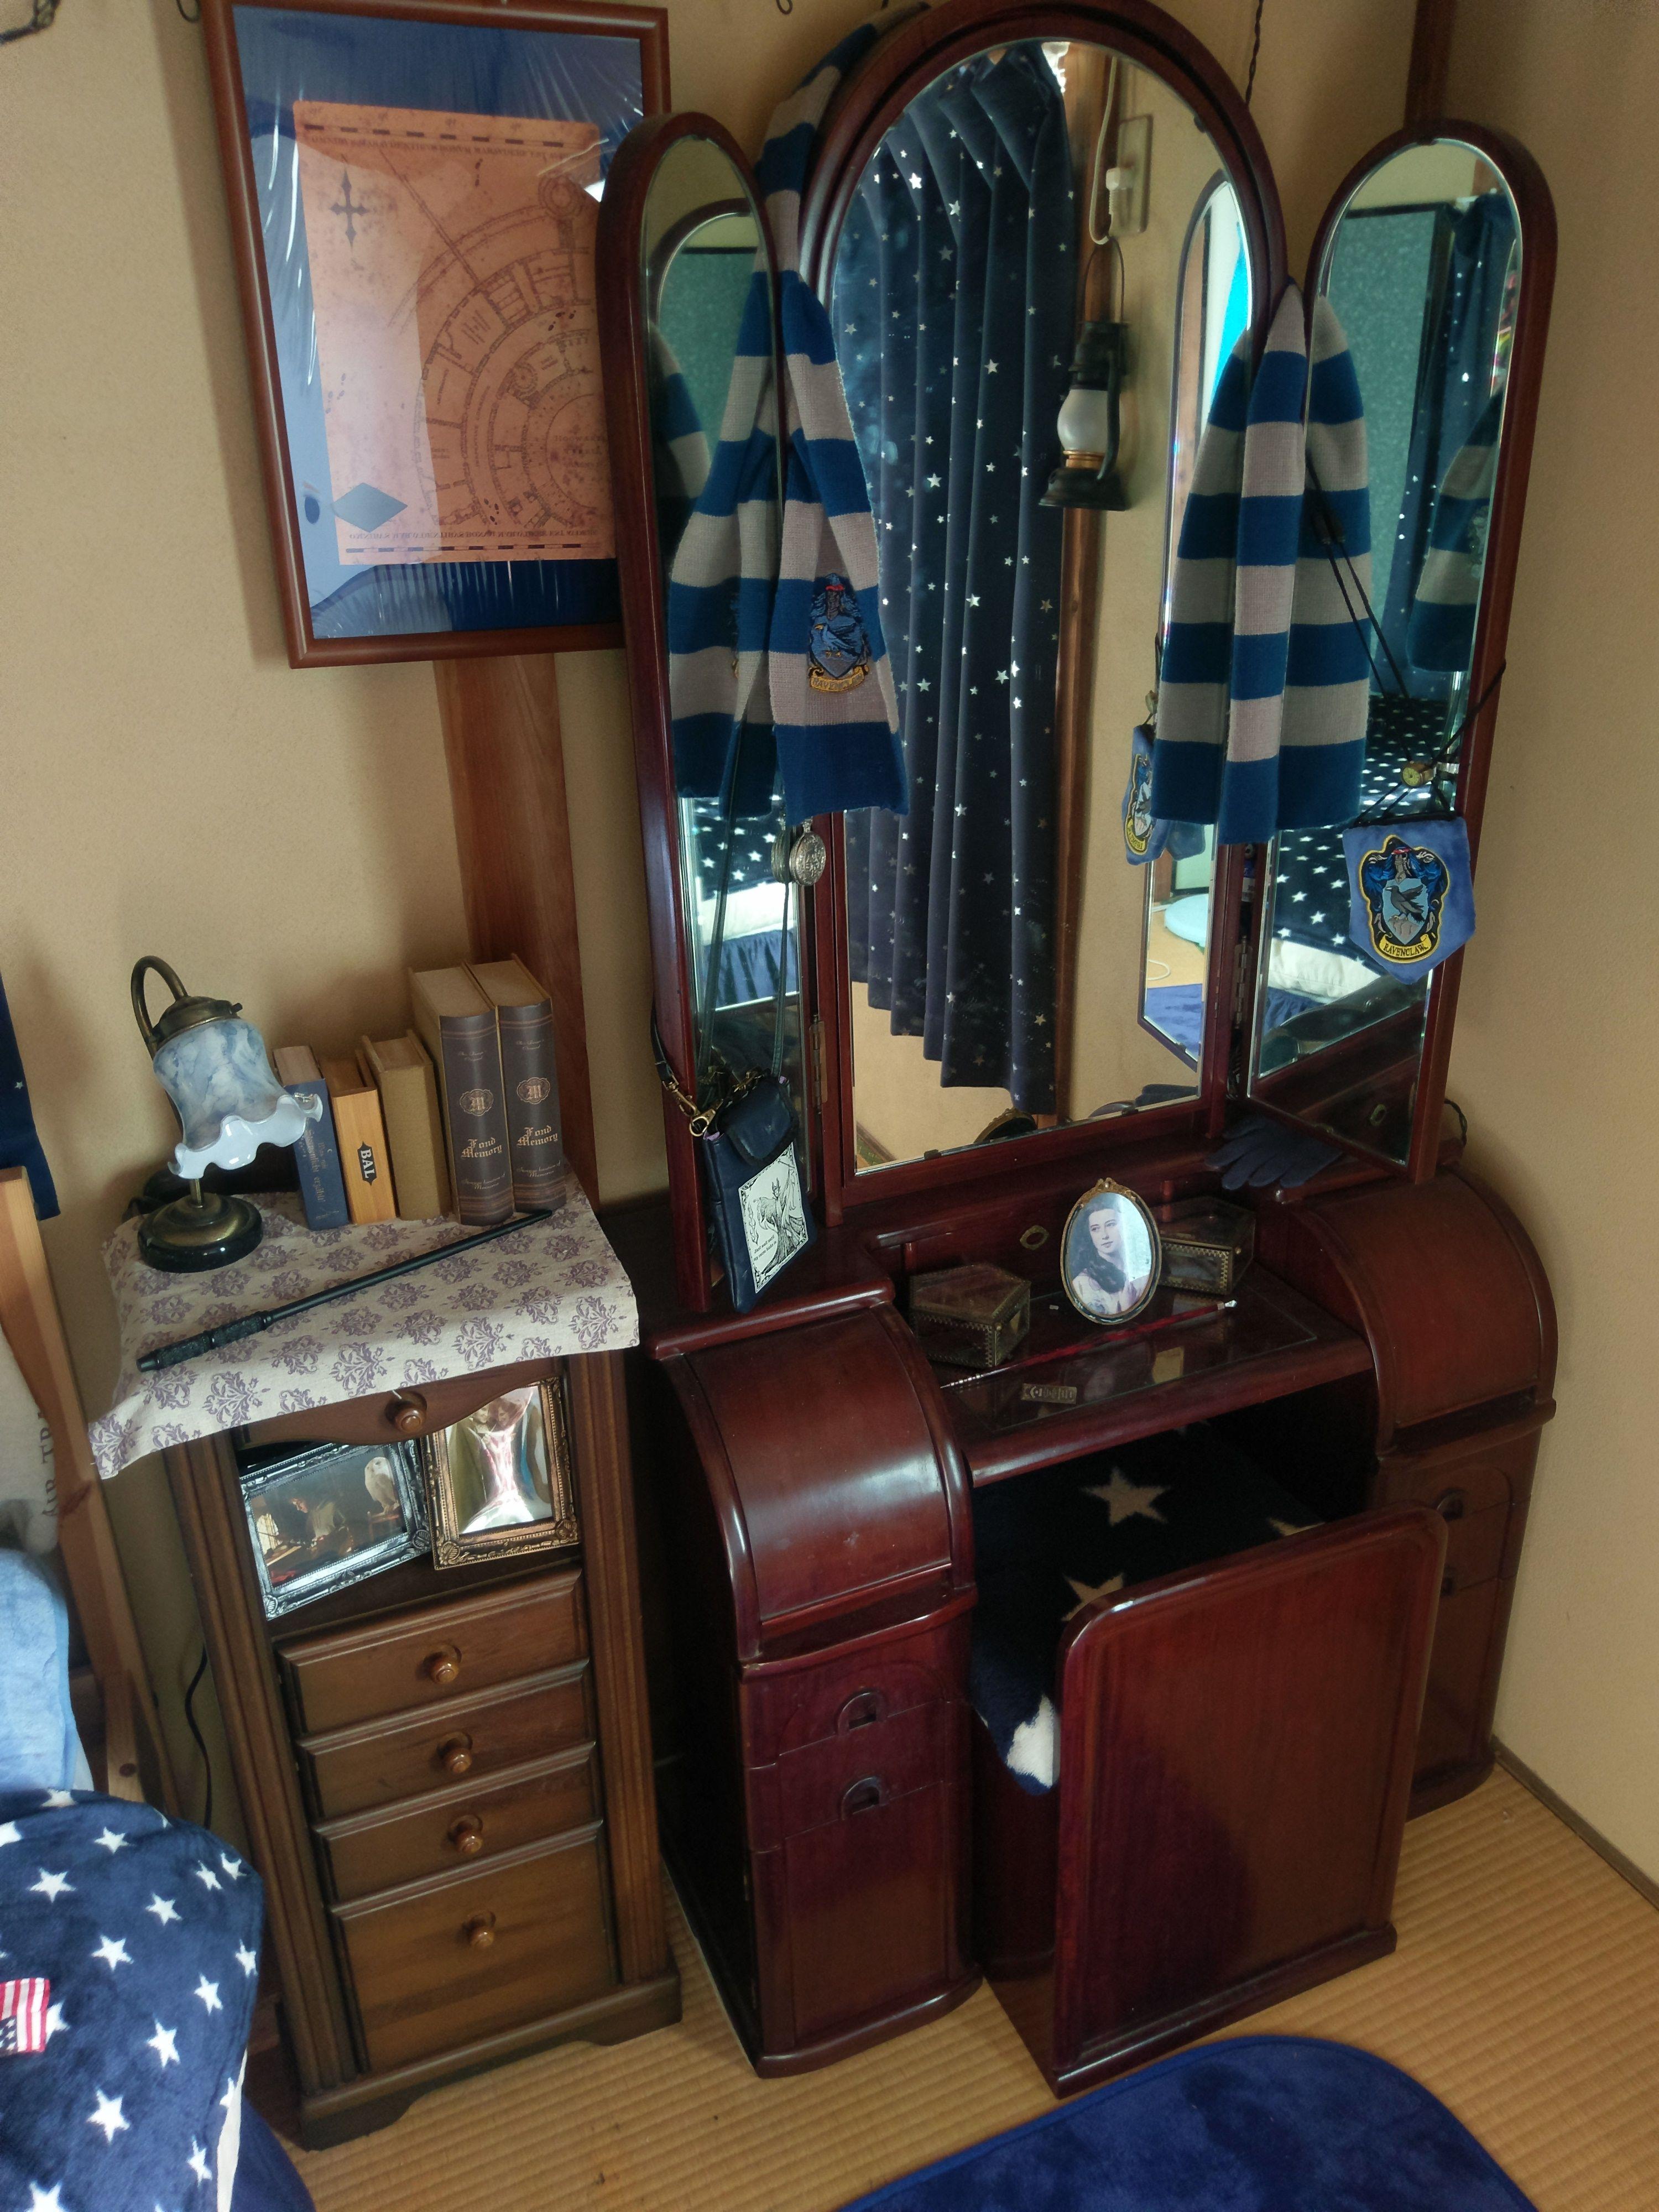 Ravenclaw Room Decor - Home Decorating Ideas